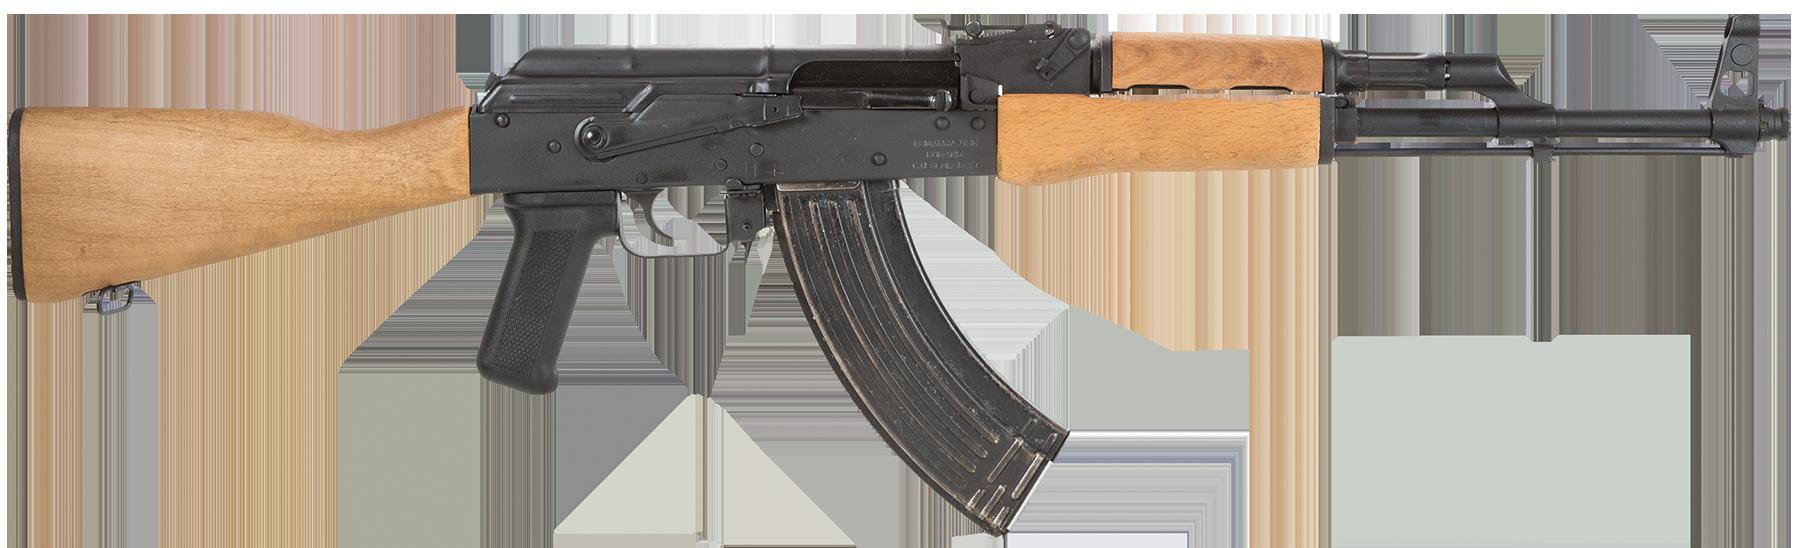 Hole clipart gun. Wooden ak png image